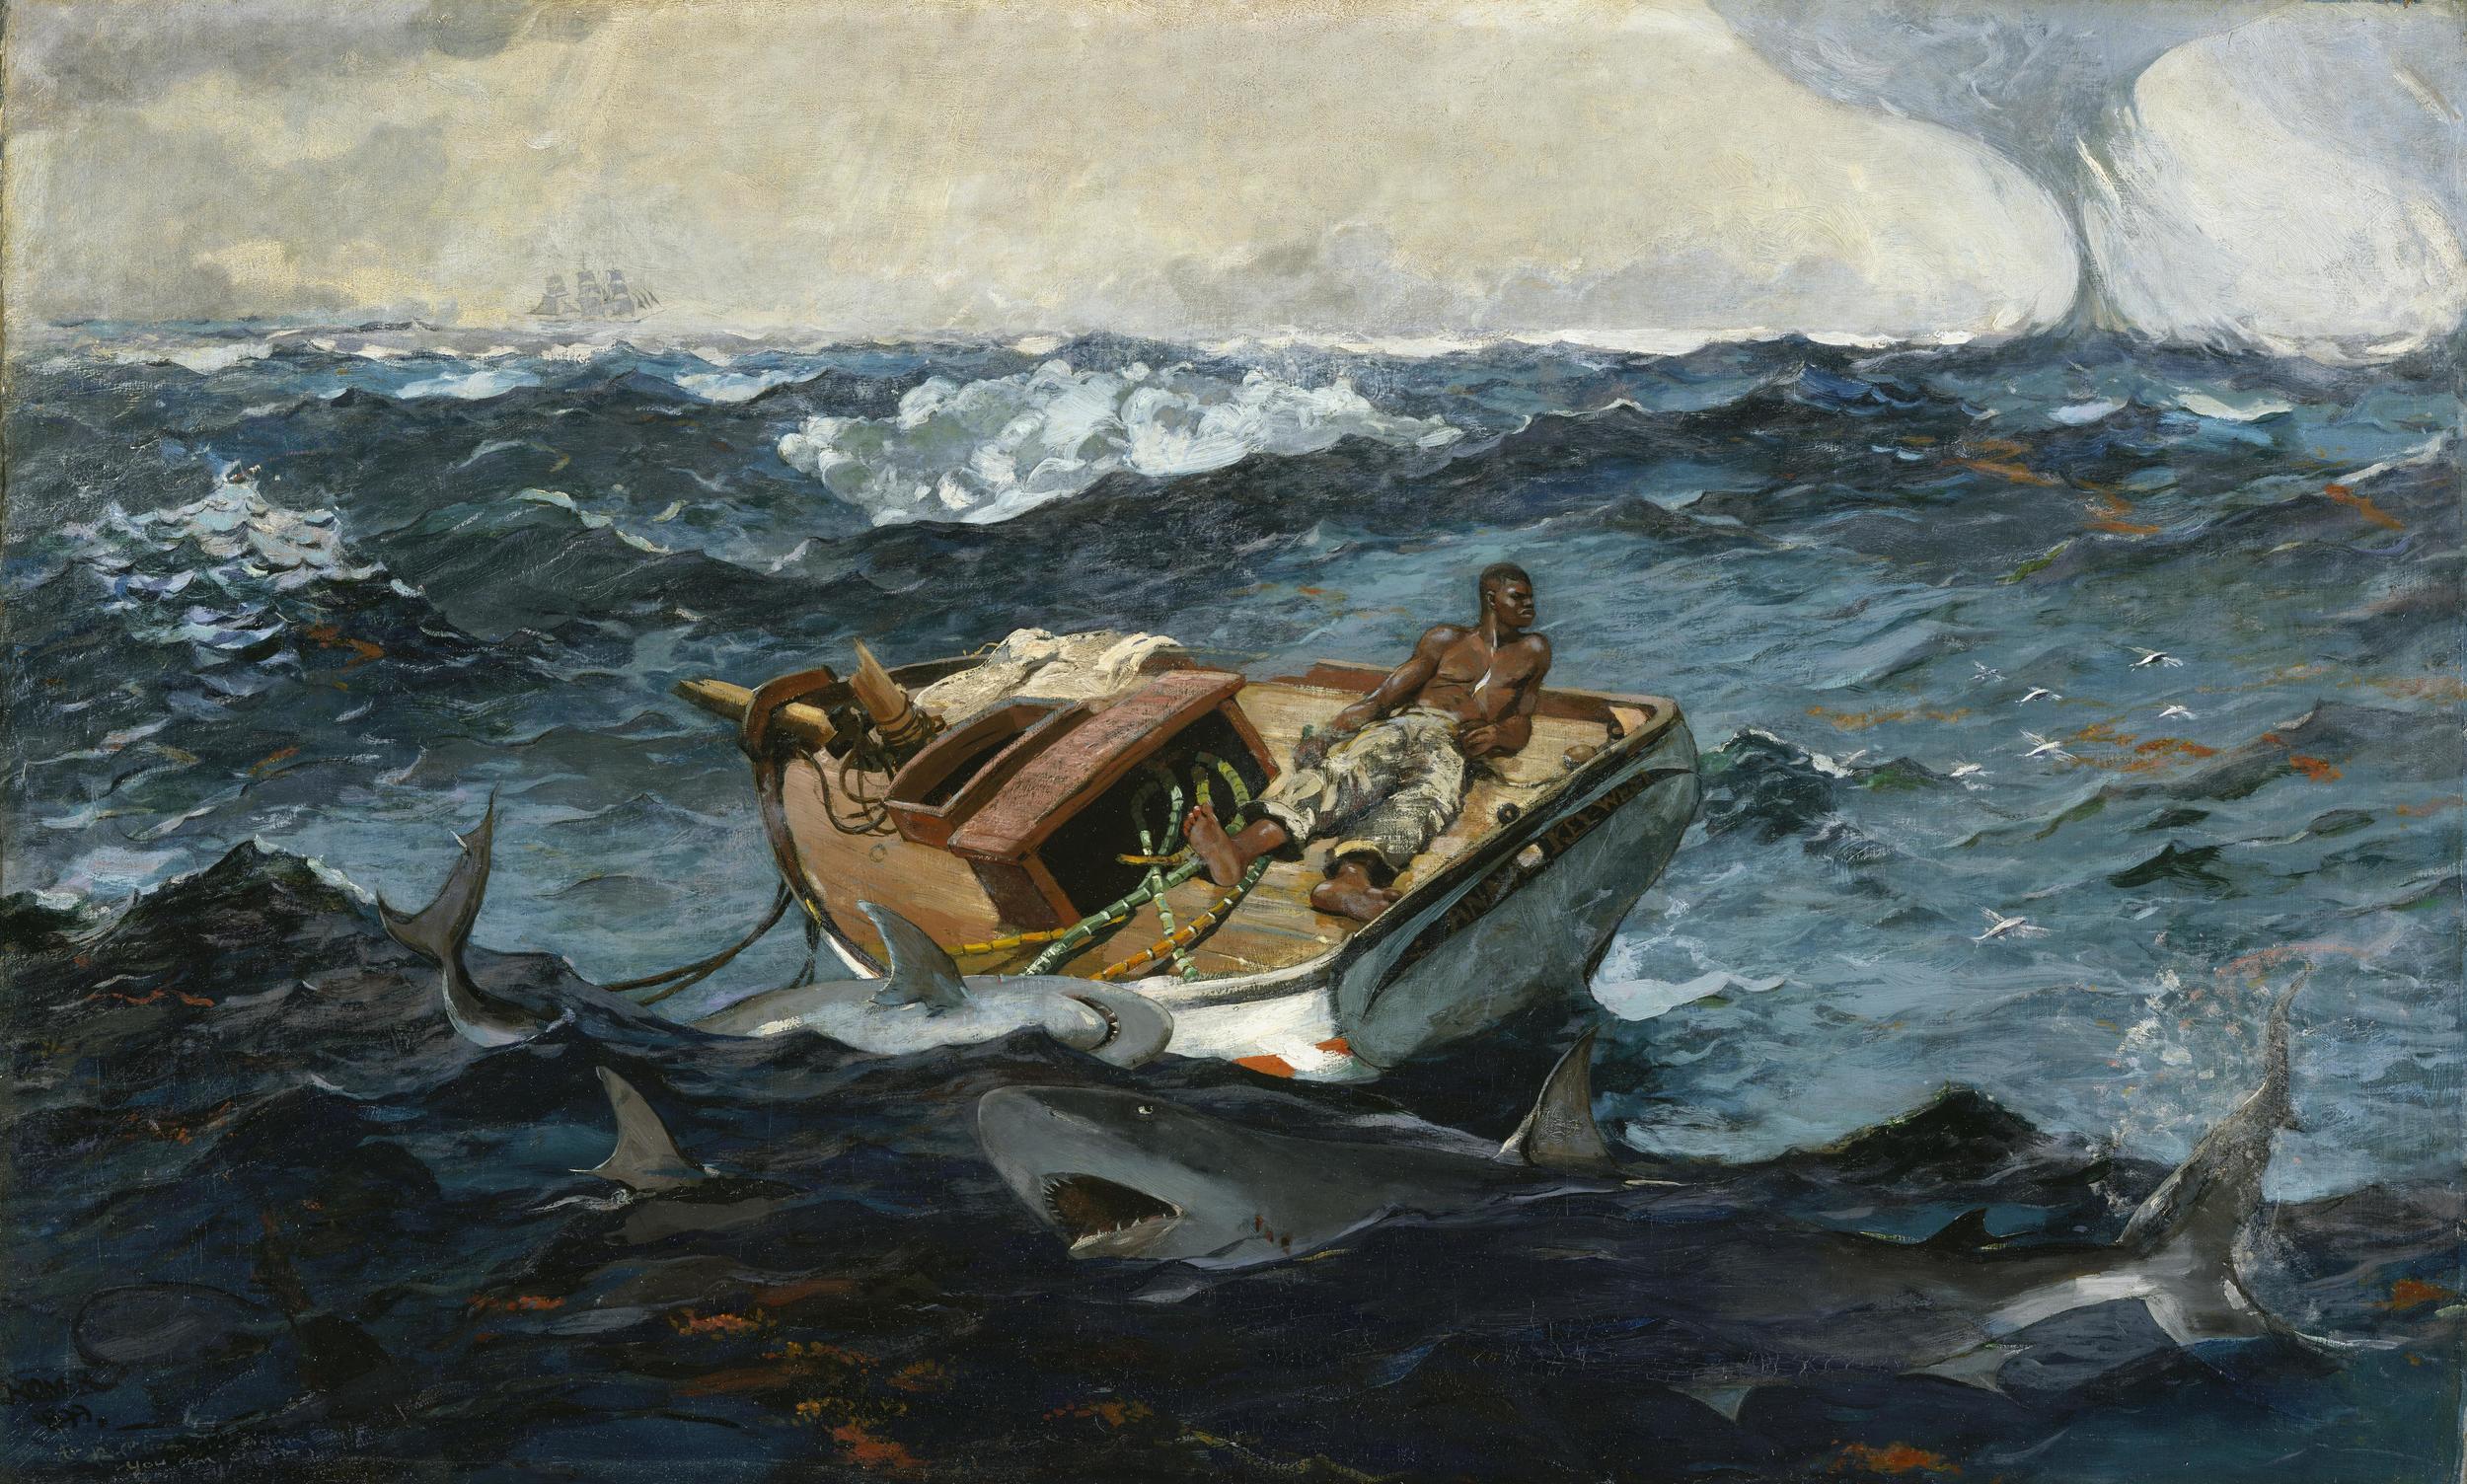 The Gulf Stream     by Winslow Homer